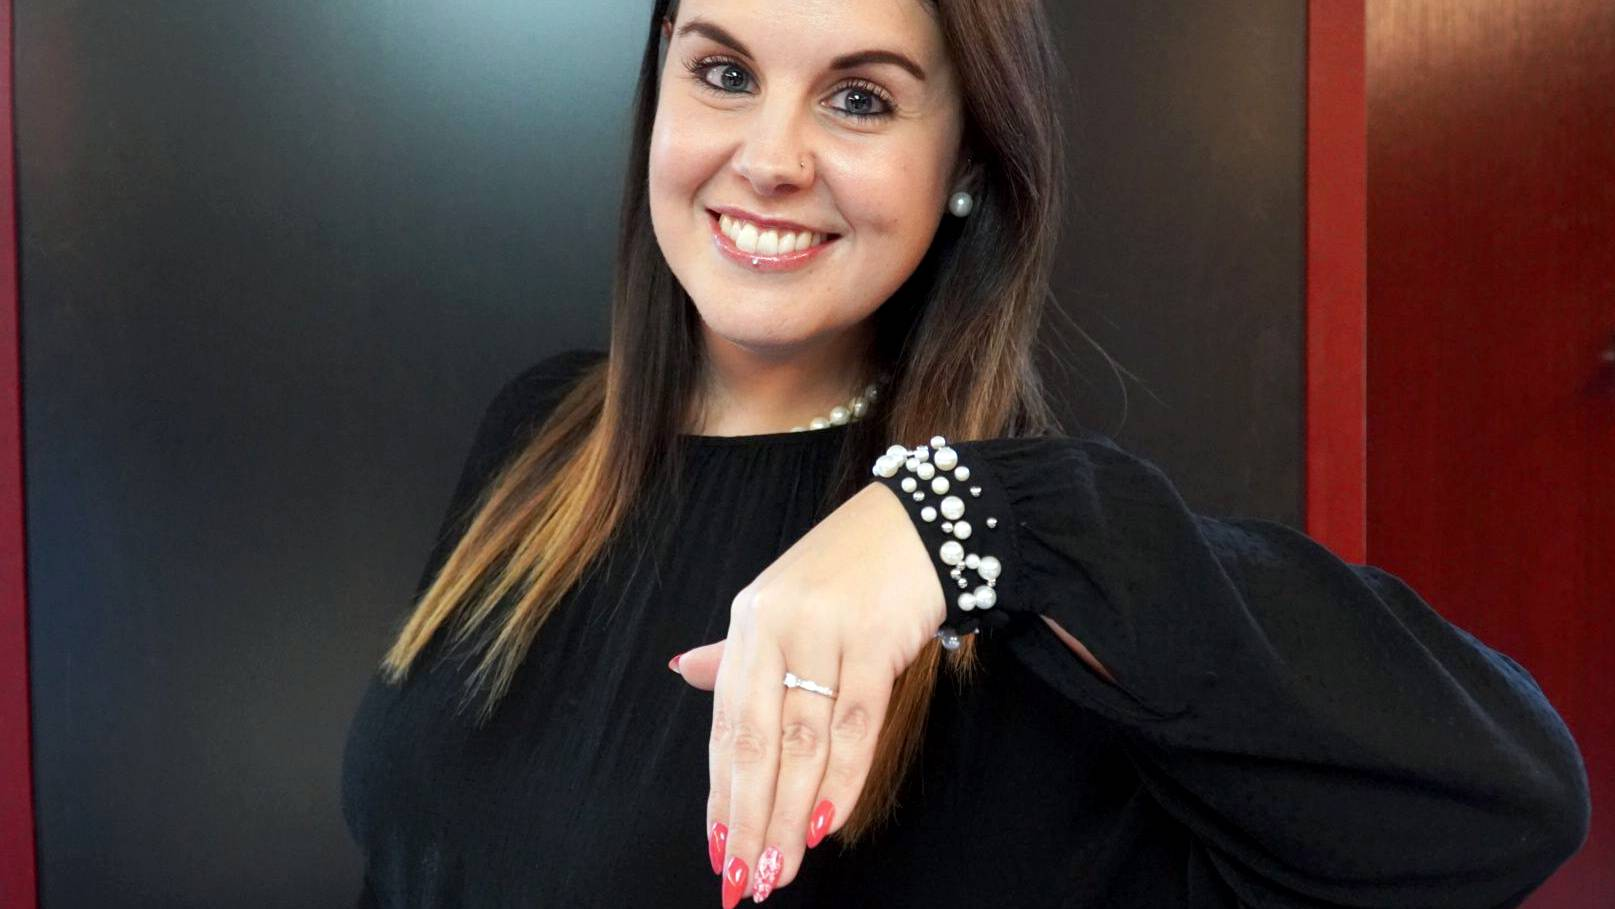 Nicole Hochzeitswoche